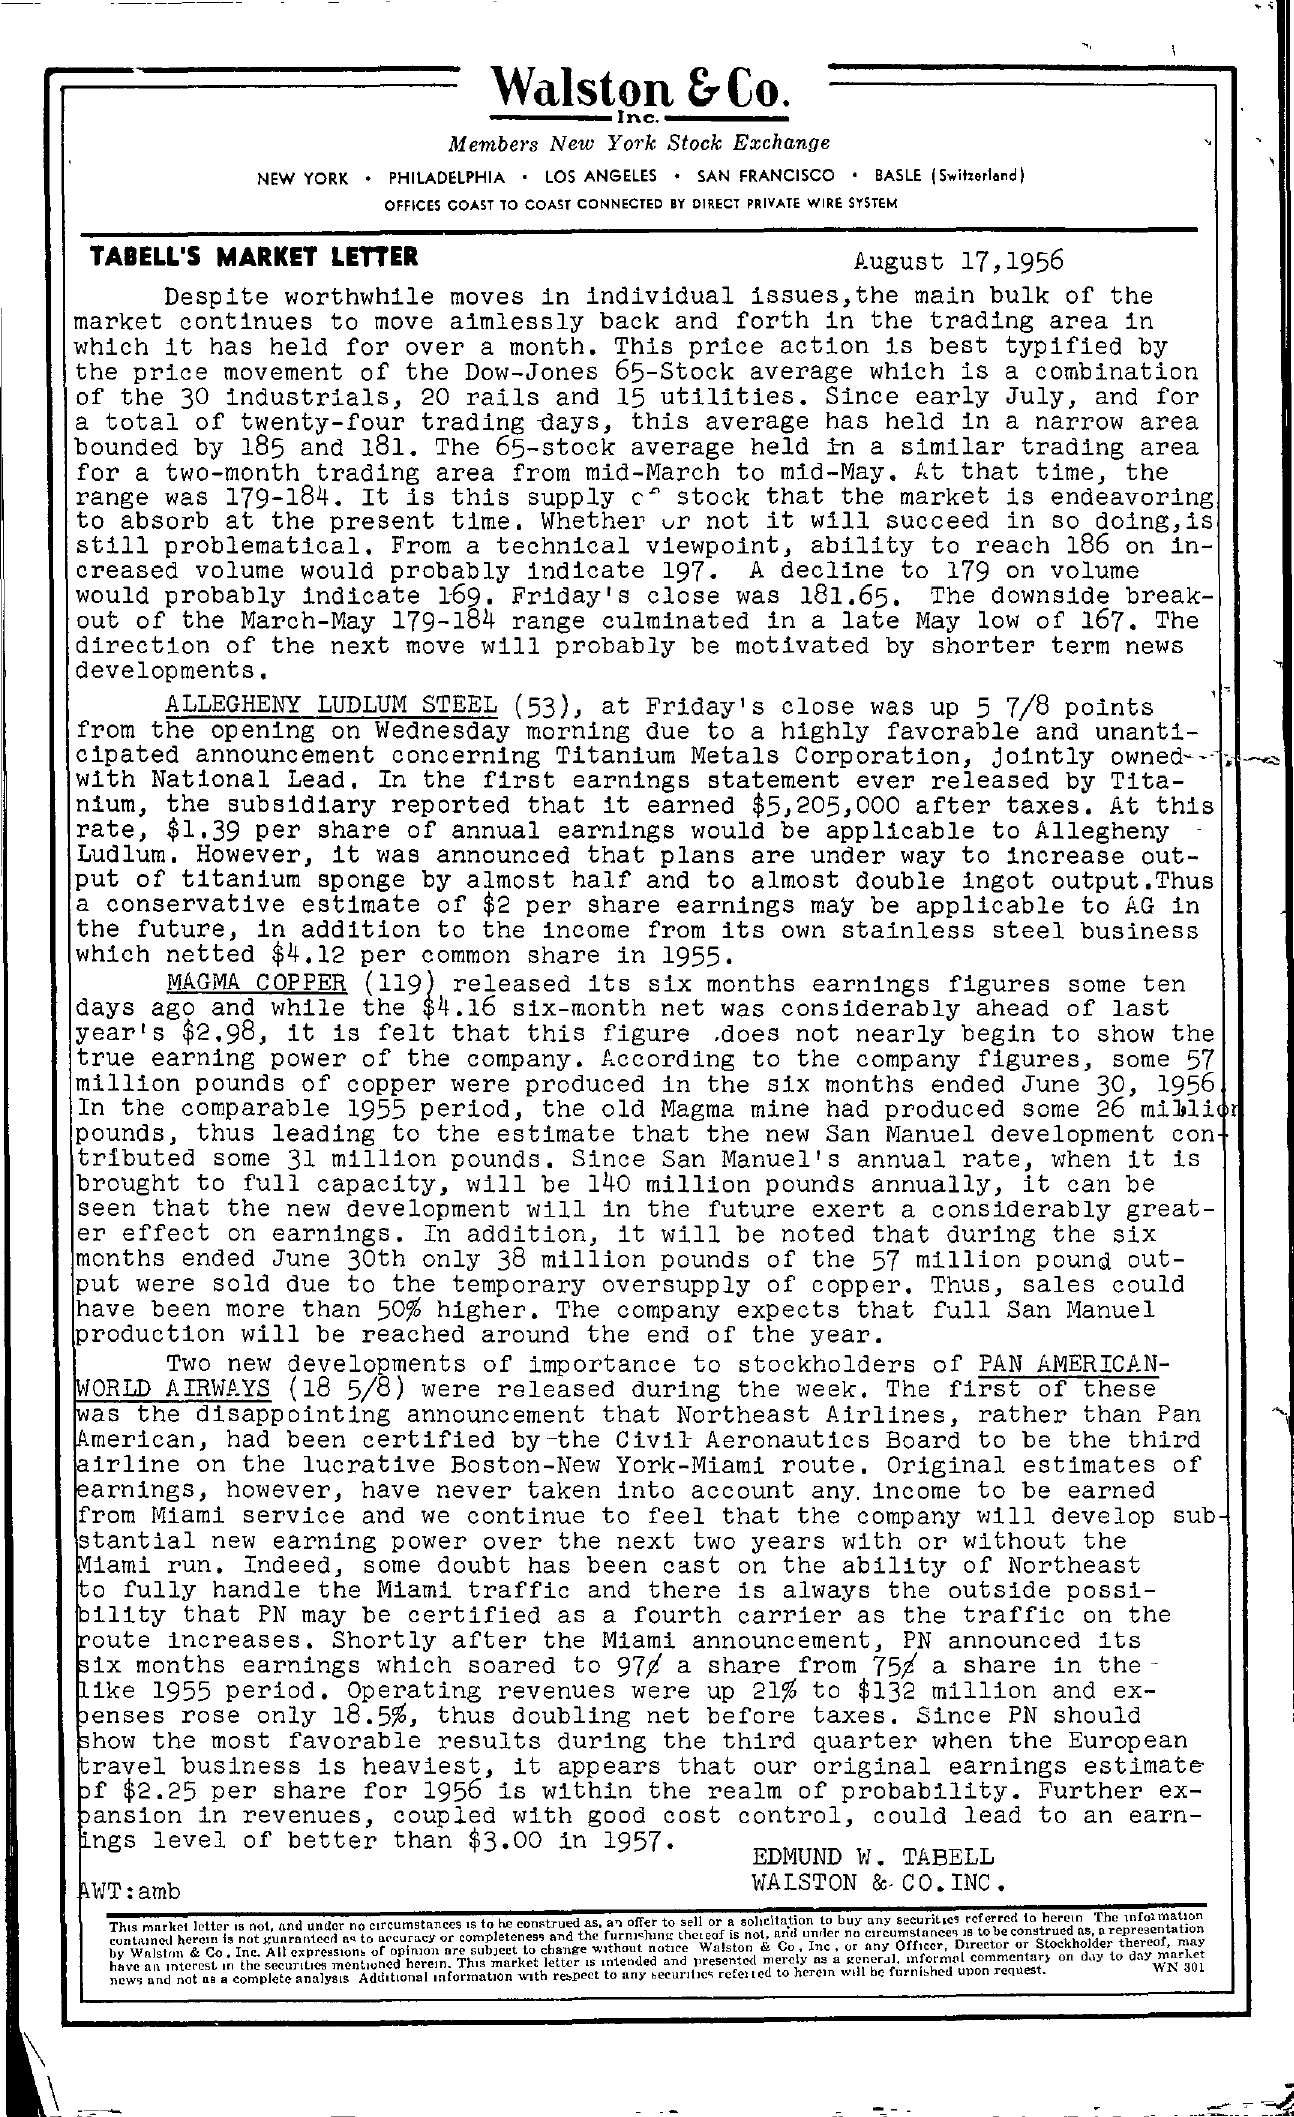 Tabell's Market Letter - August 17, 1956